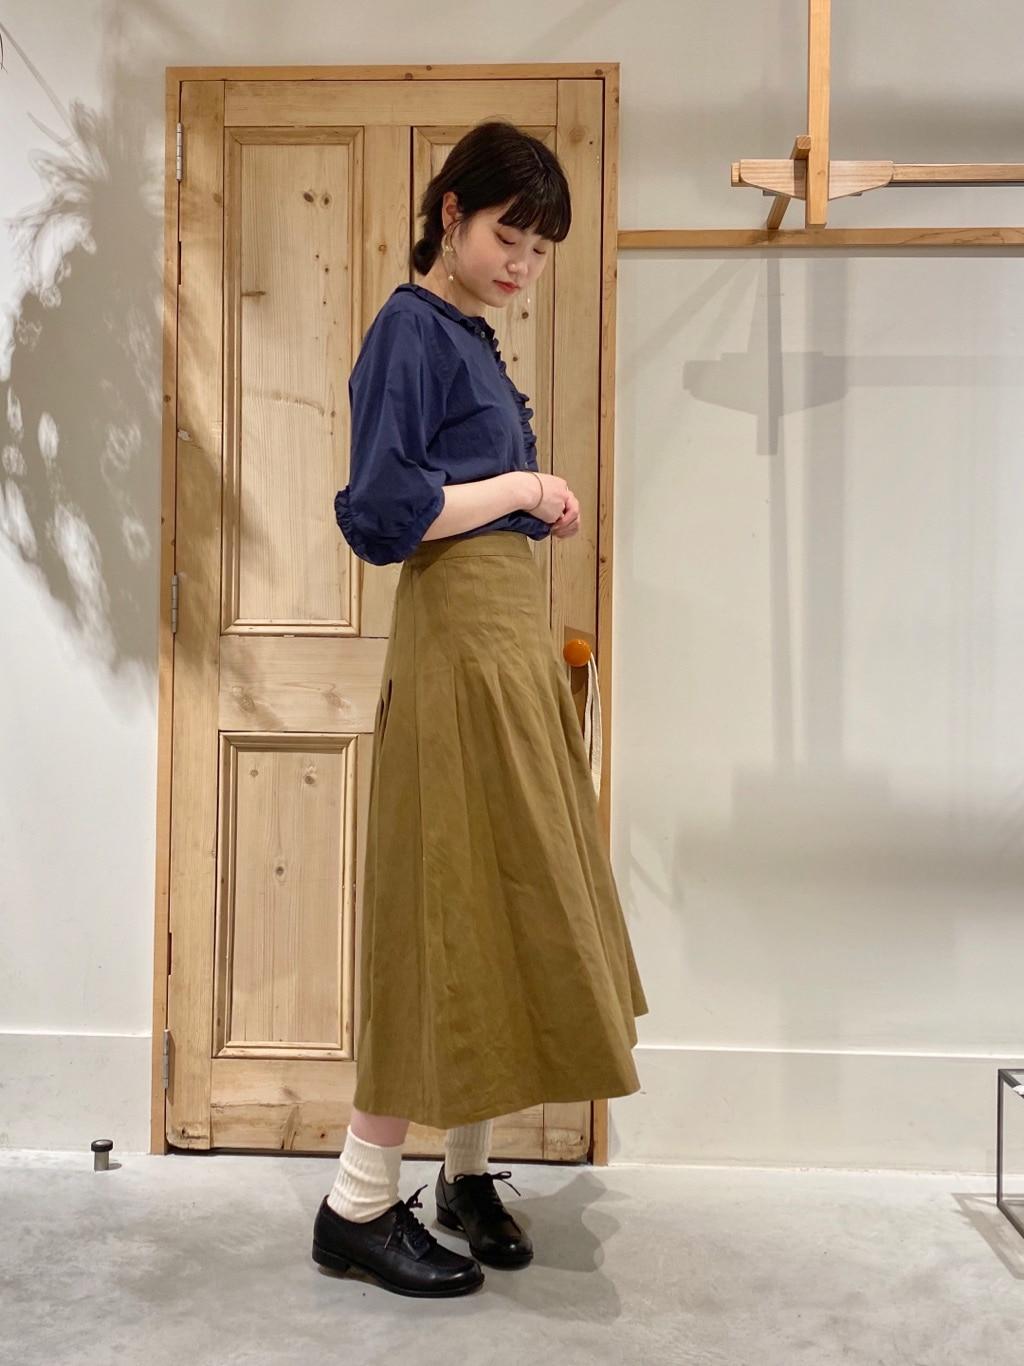 Malle chambre de charme 調布パルコ 身長:167cm 2020.06.24